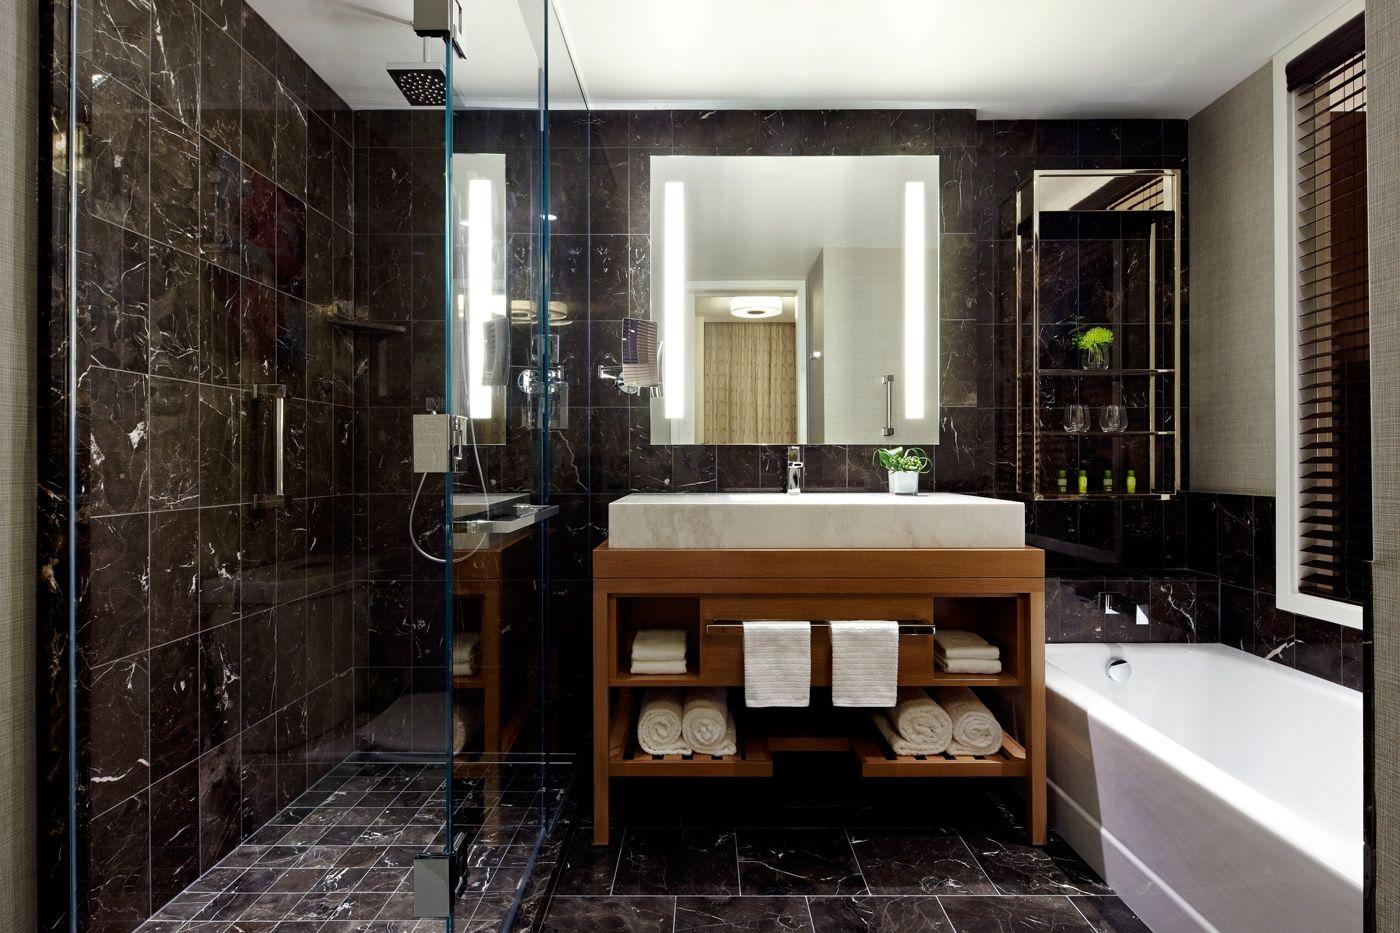 Bathroom Design Toronto Inspiration Delta Toronto  Champalimaud Design  Bathroom Design  Pinterest Inspiration